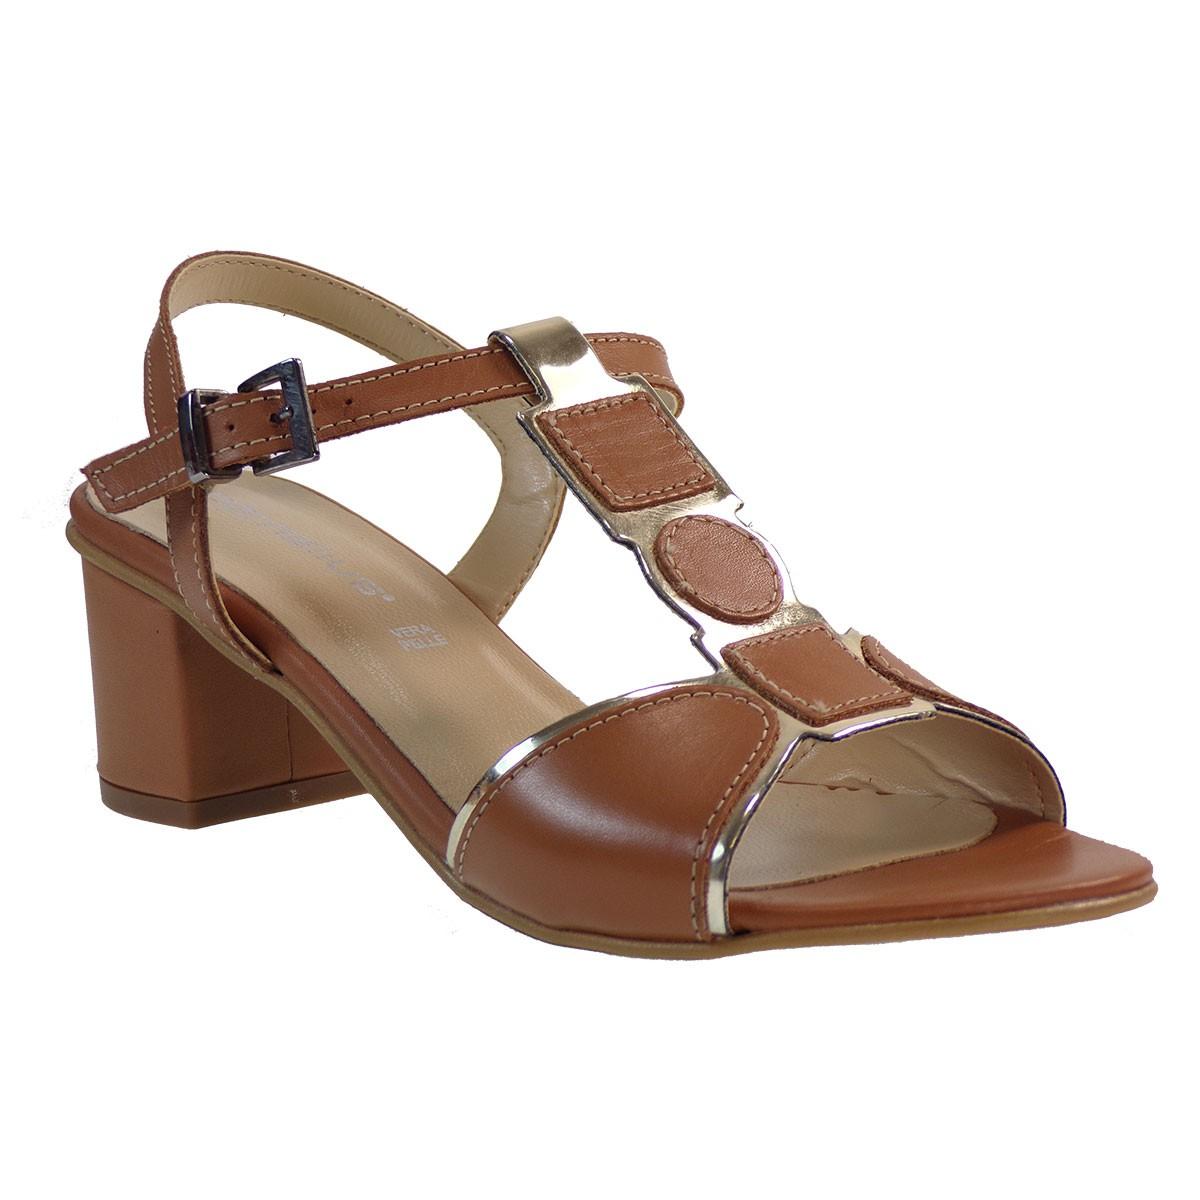 Cornelius Shoes Γυναικεία Πέδιλα 31-9500 Ταμπά